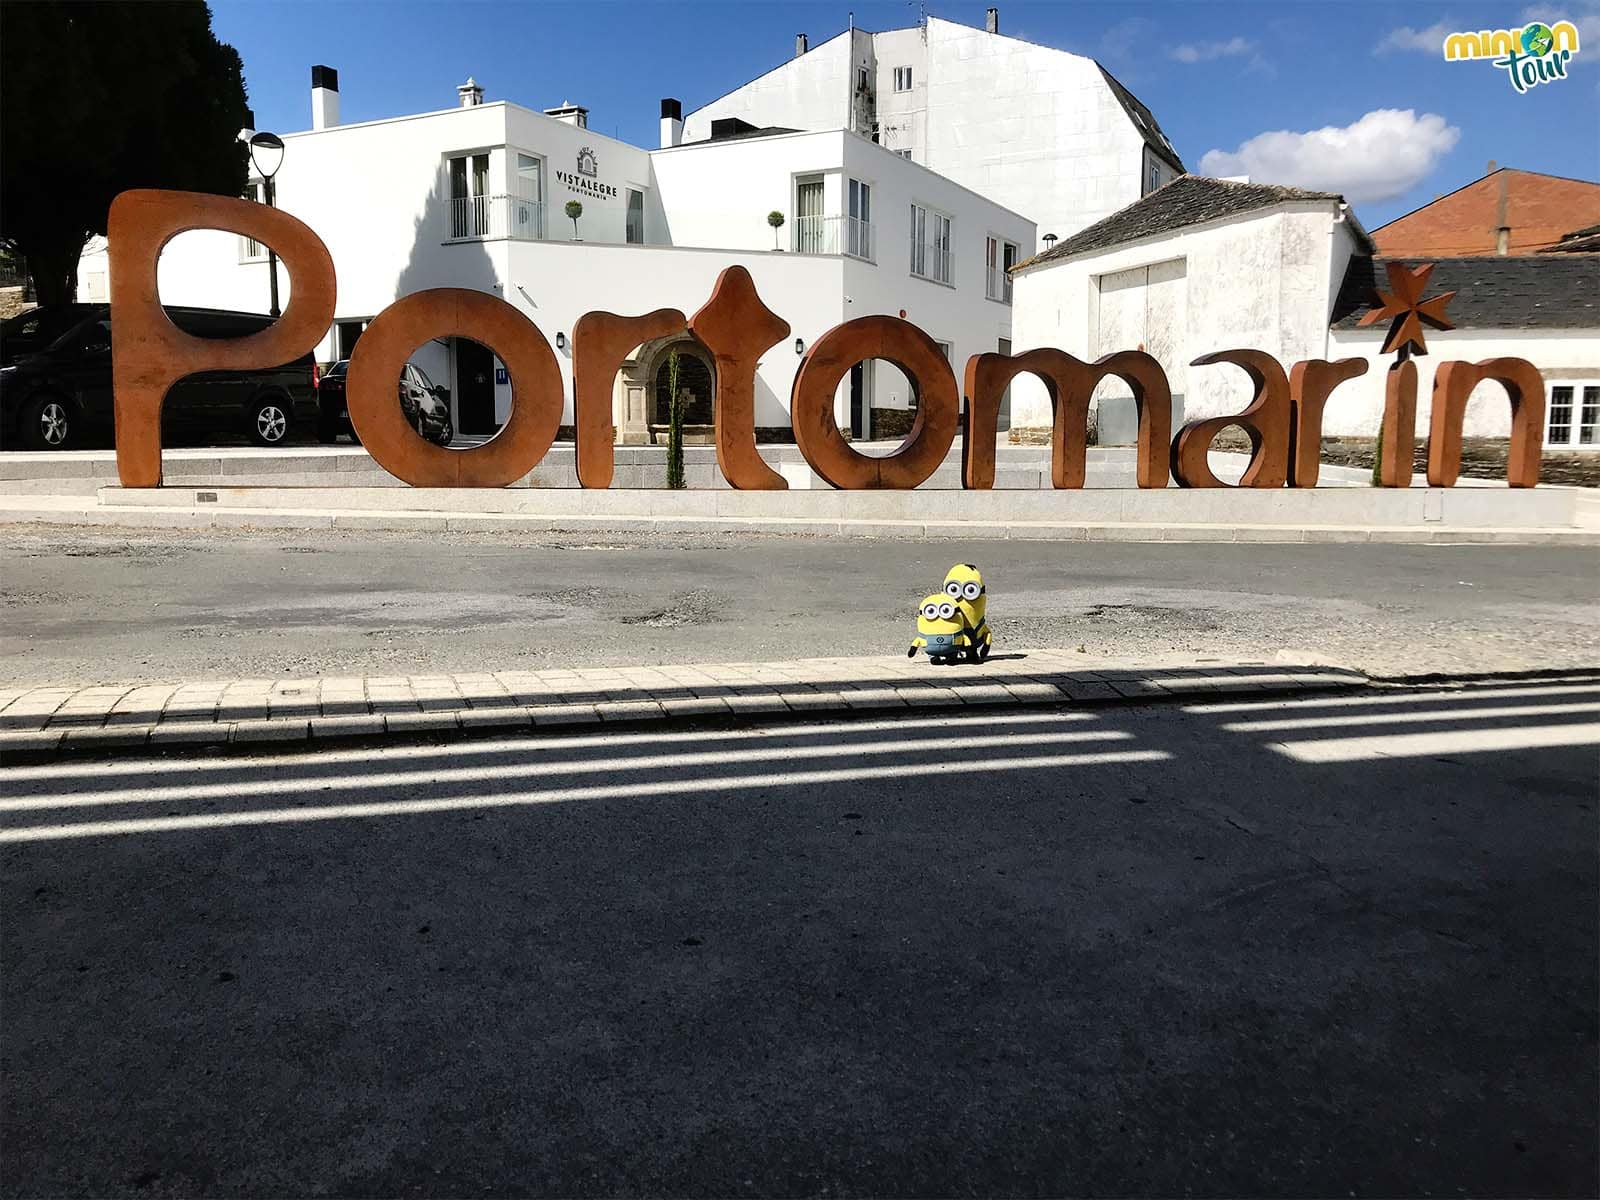 Qué ver en Portomarín, puerta de entrada de la Ribeira Sacra